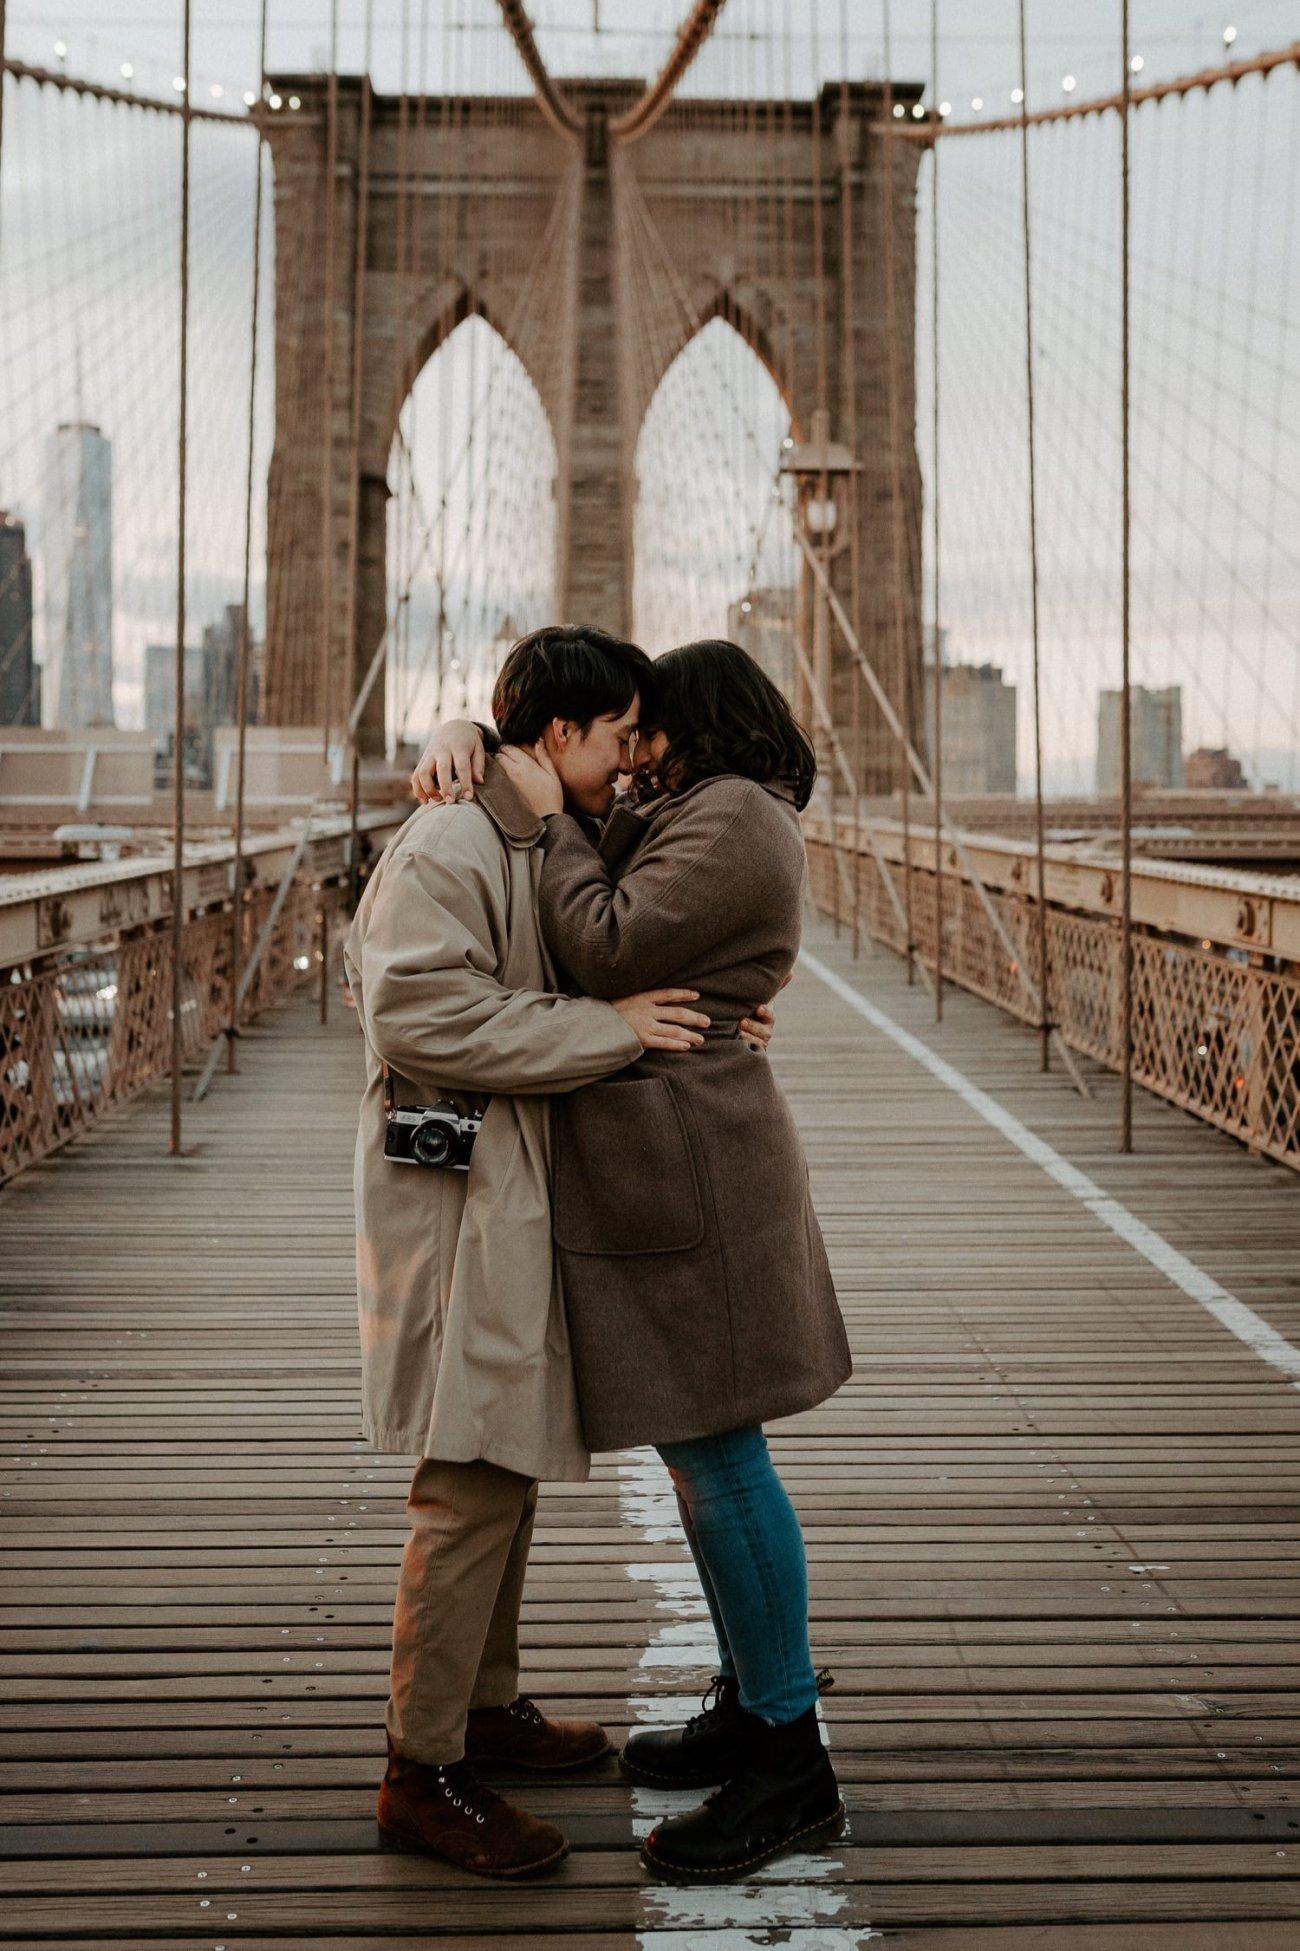 Brooklyn Bridge Sunset Couple Session New York Wedding Photographer NYC Best Engagement Photos Location Anais Possamai Photography 12